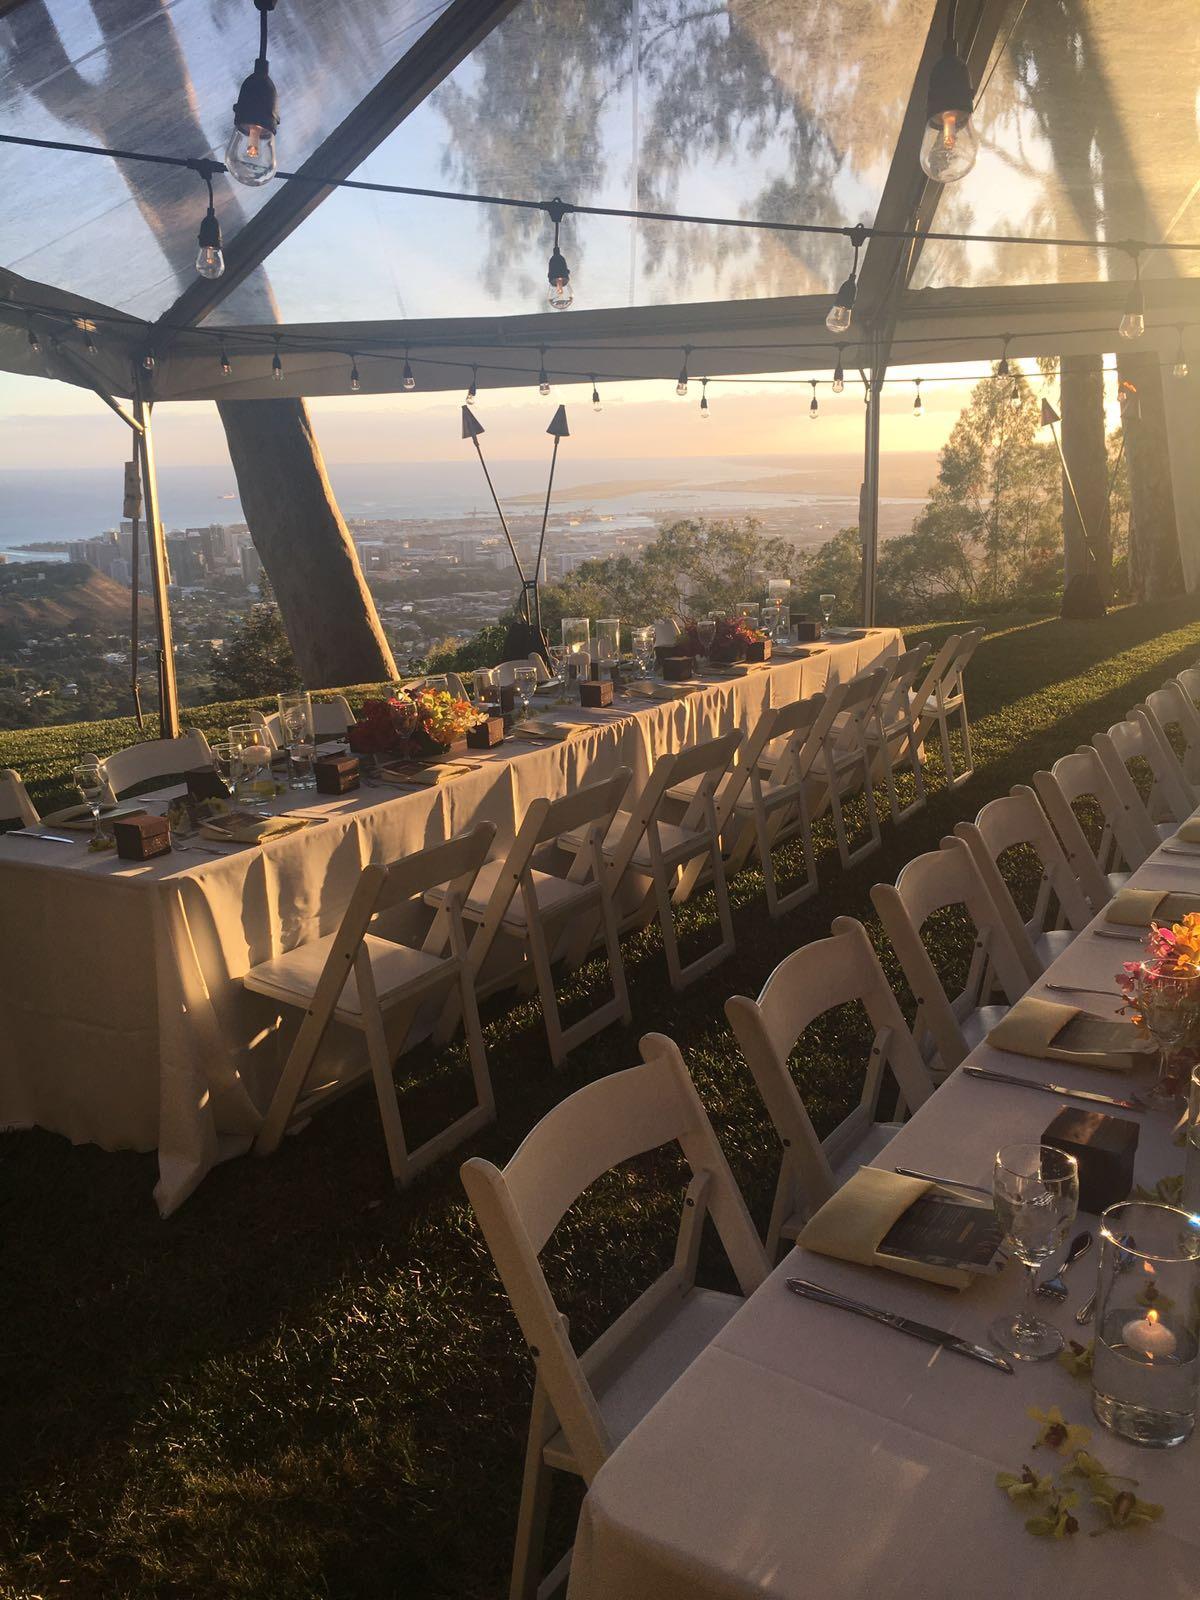 Dinner at sunset overlooking Honolulu and Waikiki.